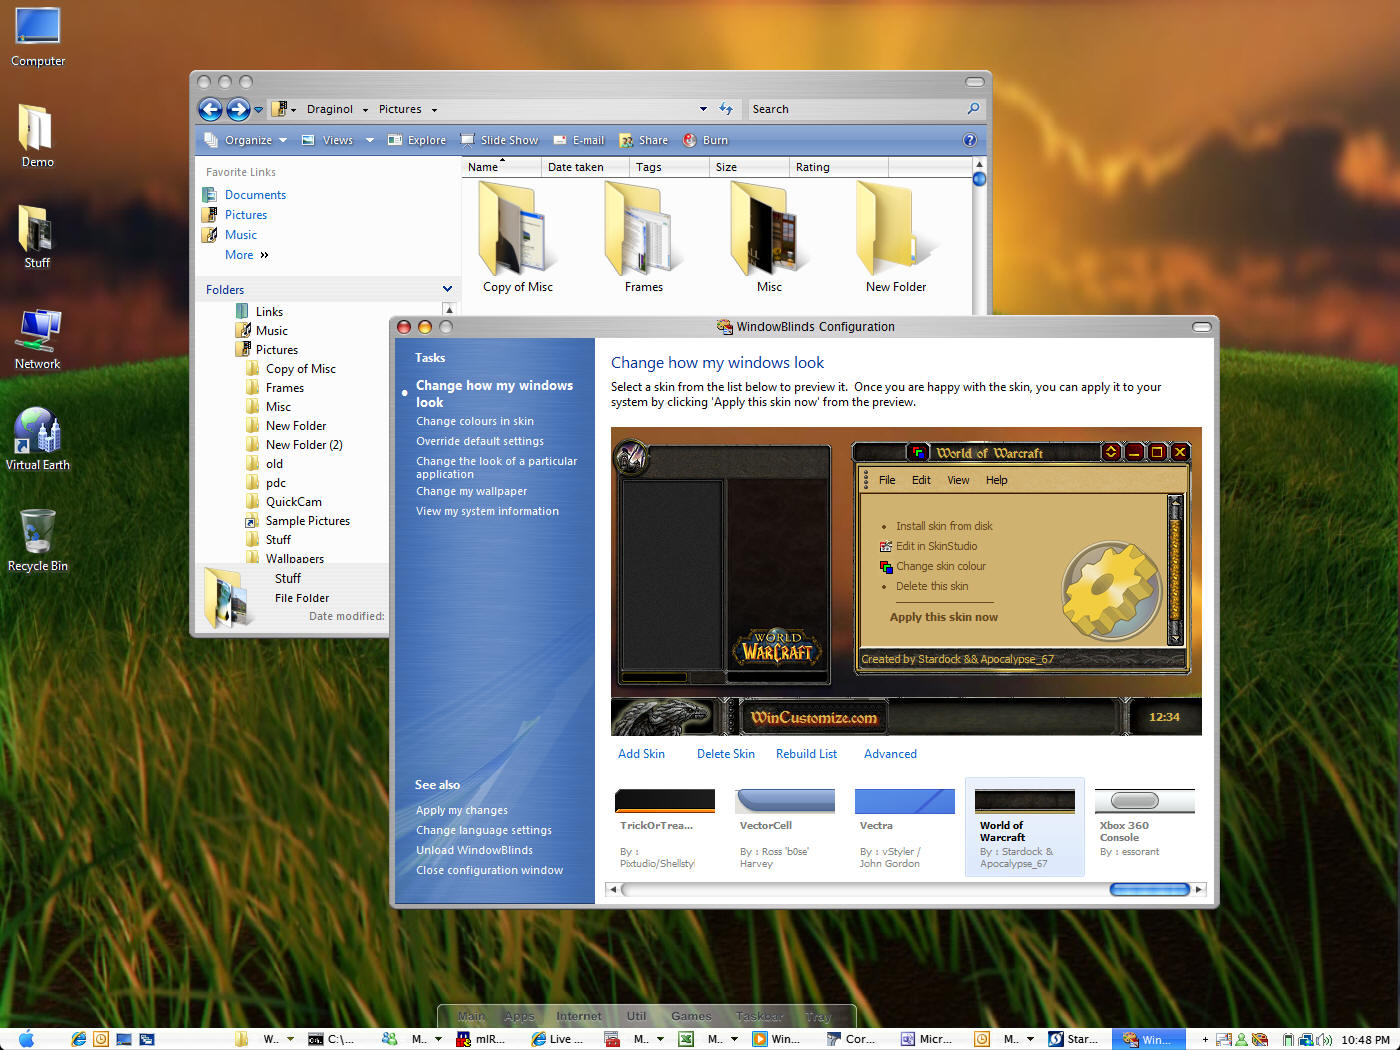 Firefox bet at home warunki premii wiernych Crash Windows 7